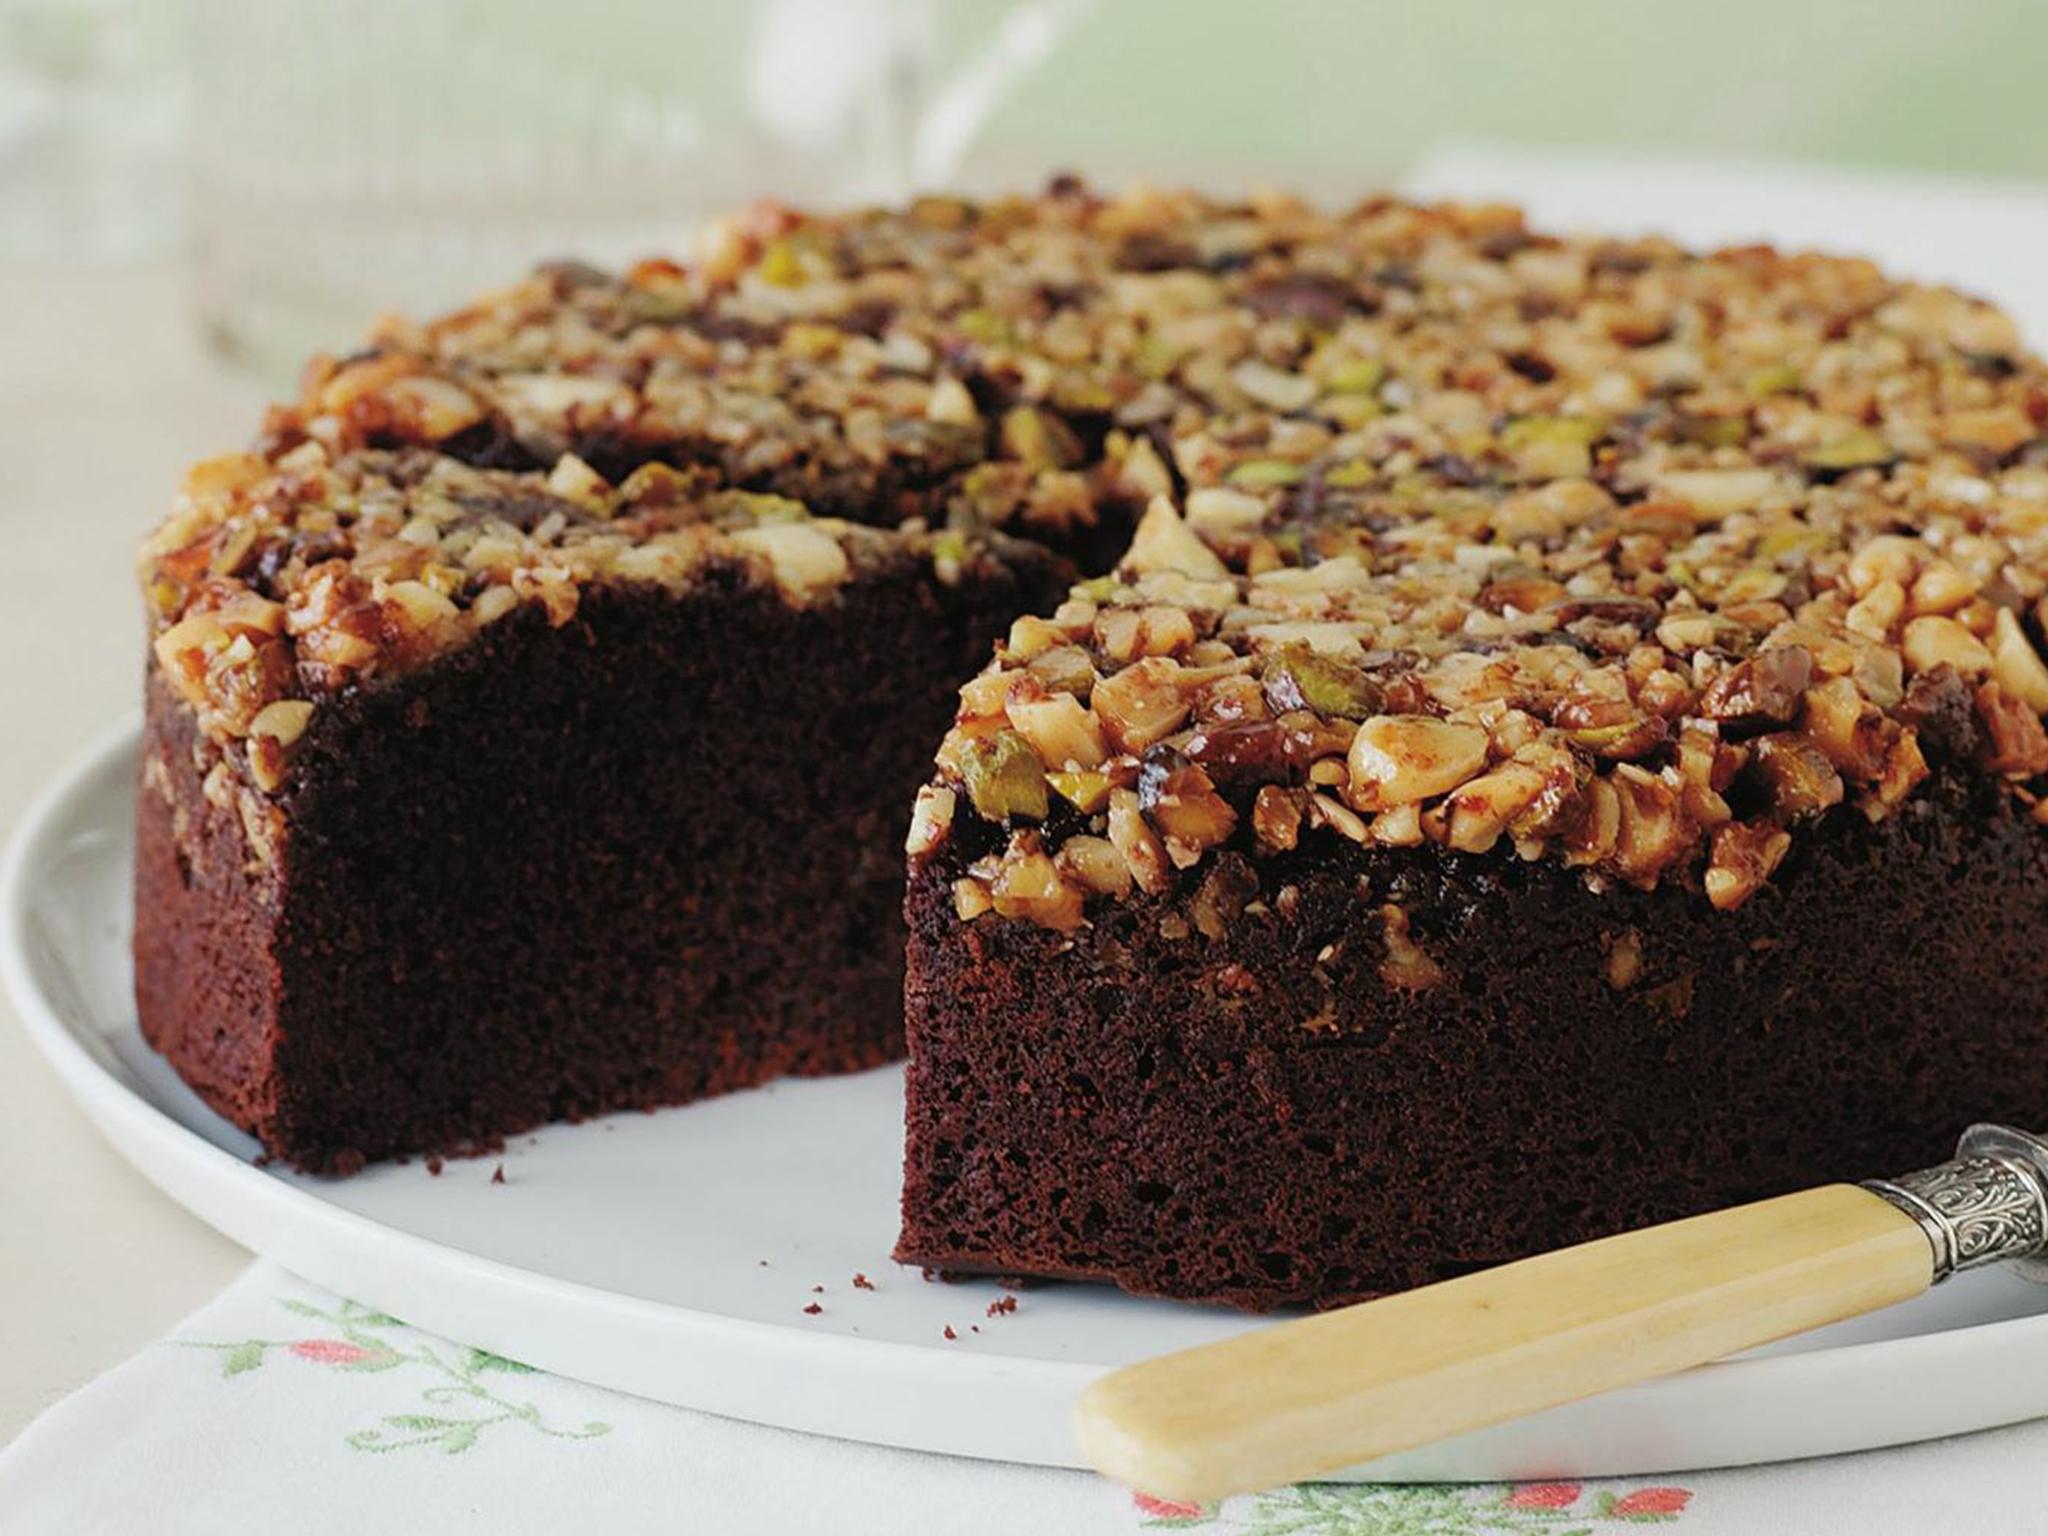 Caramel mud cake recipe without chocolate